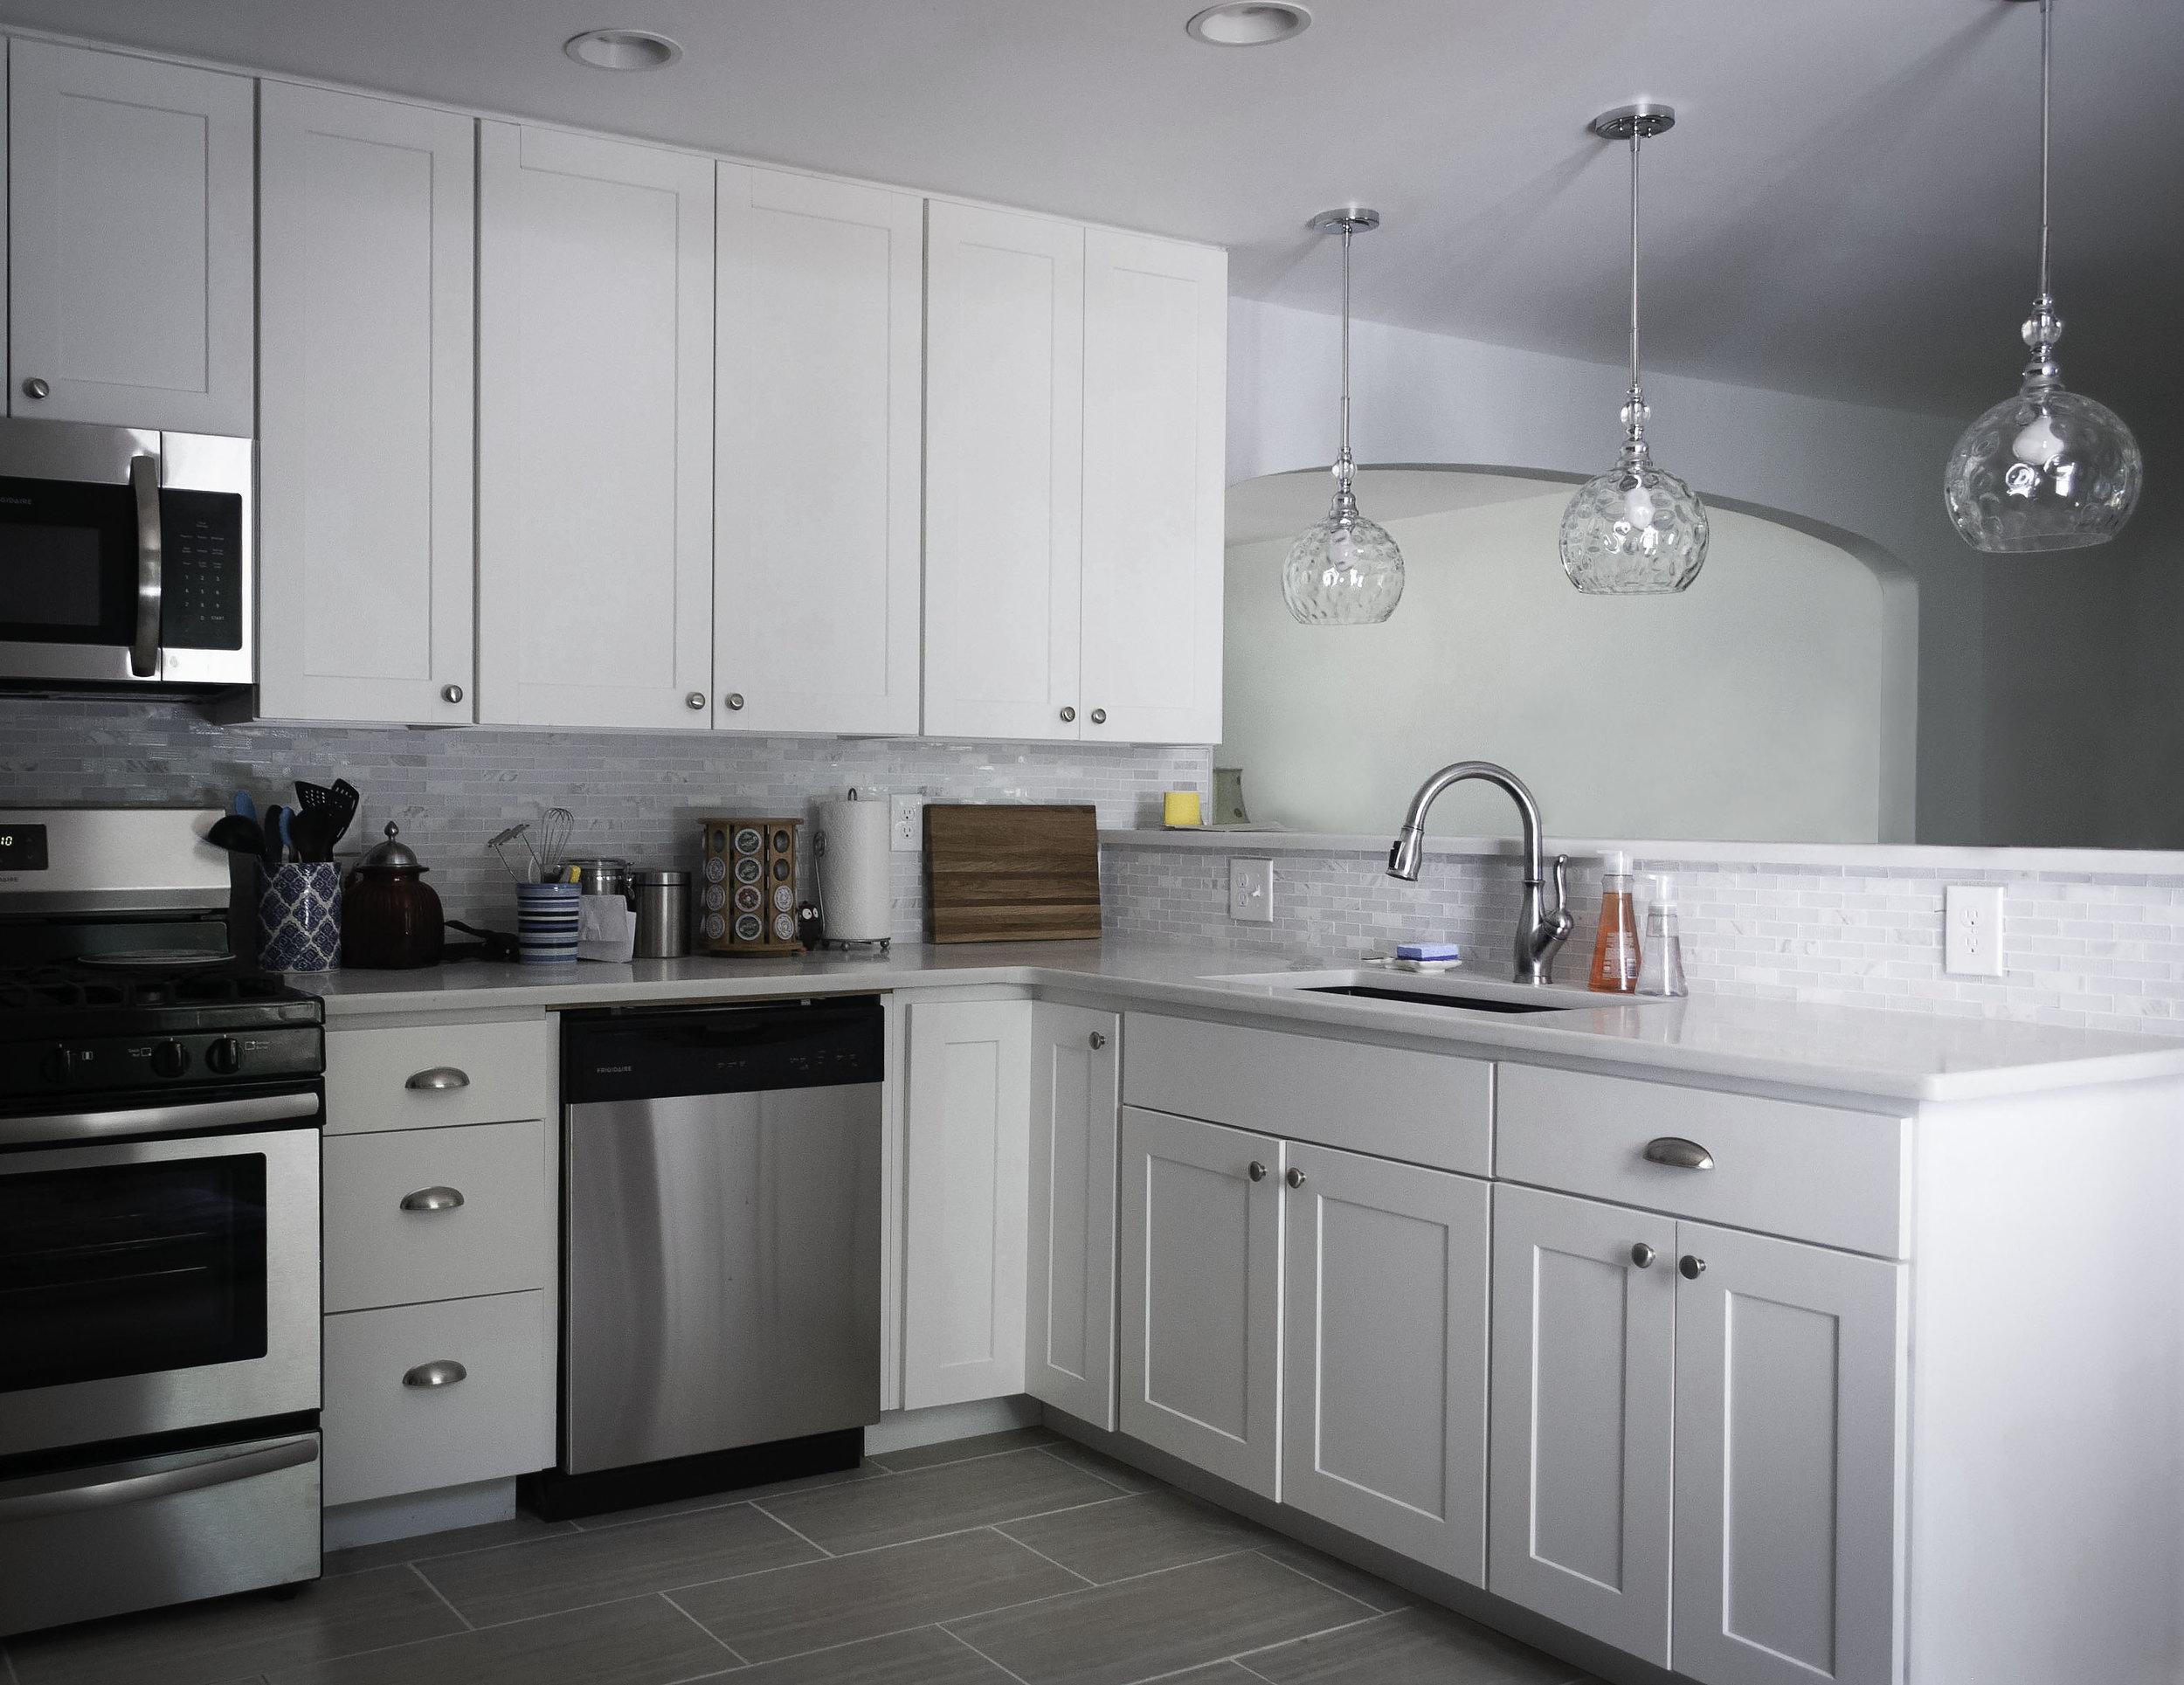 cohasset kitchen-2.jpg